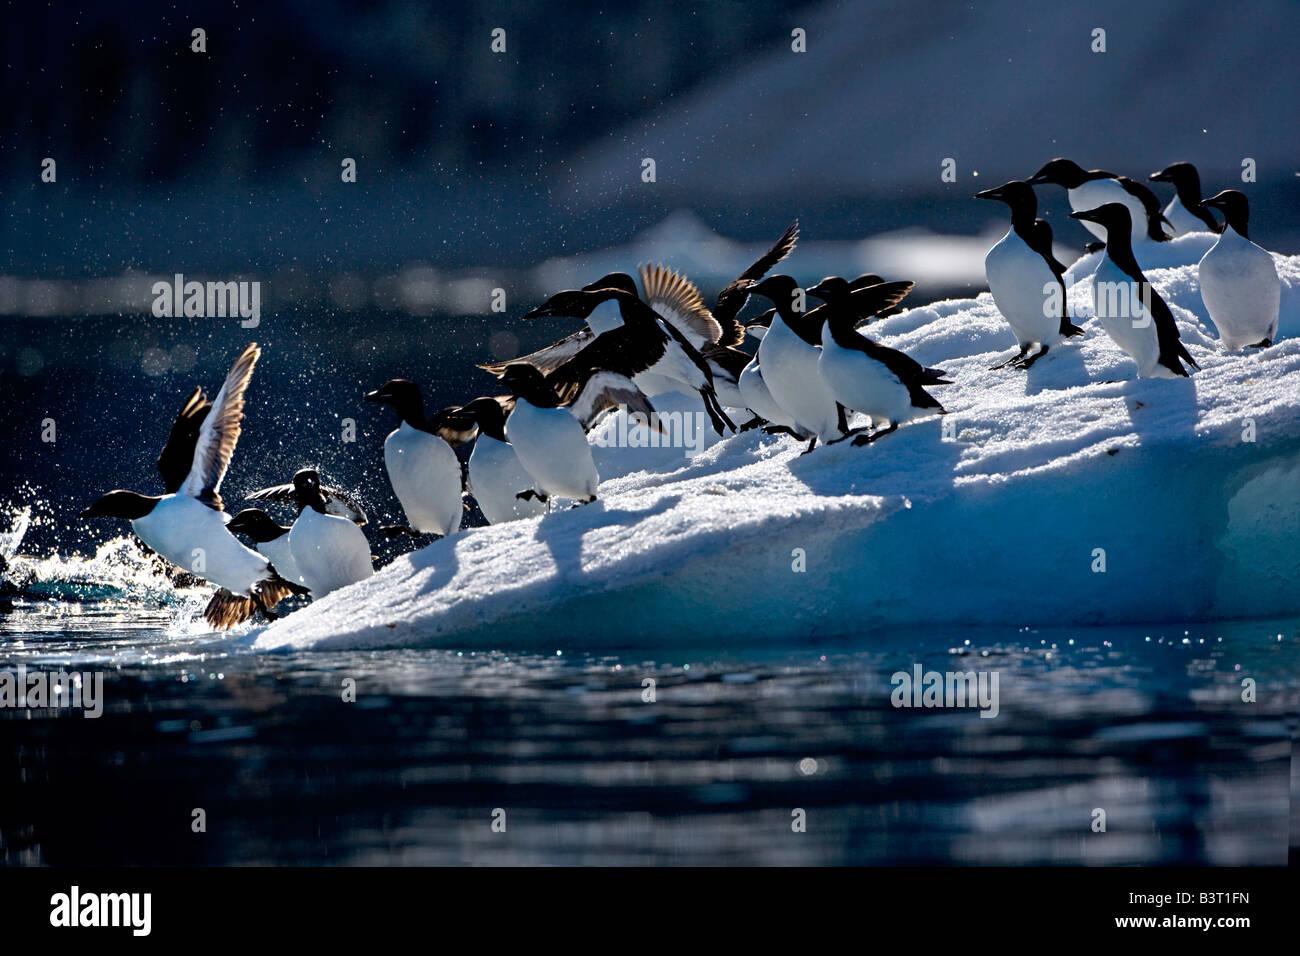 Thick-billed Murre (Uria lomvia) - Stock Image